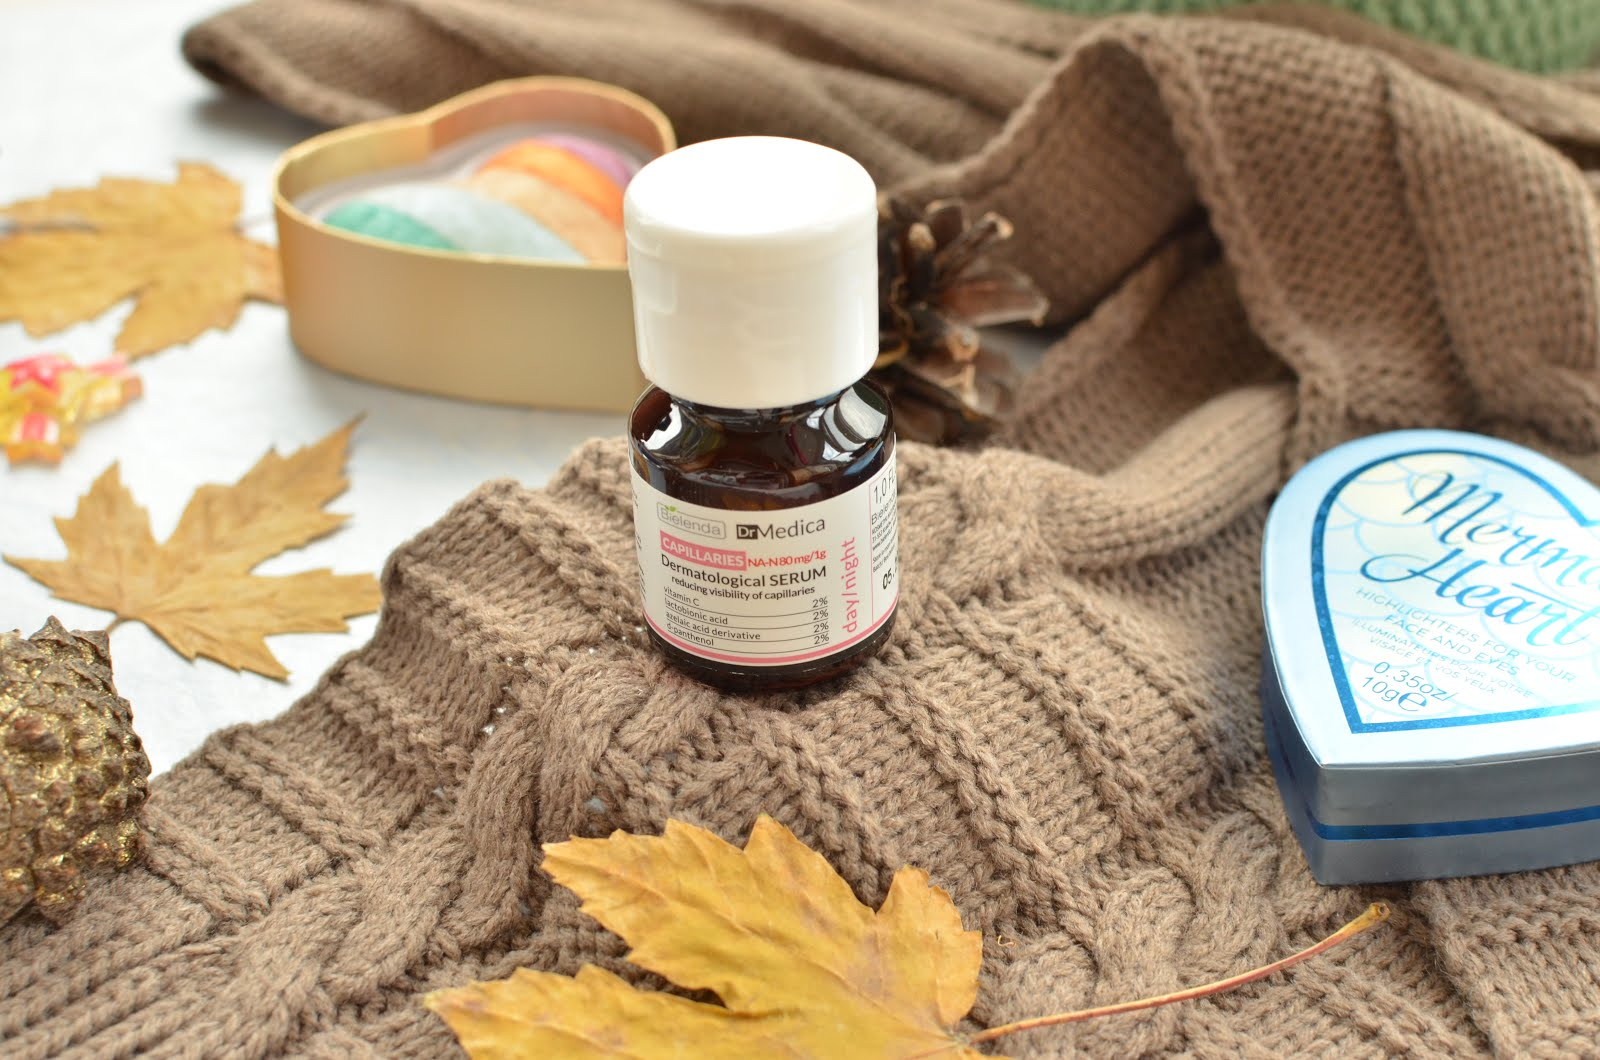 Bielenda Dr Medica Capillaries Dermatological Serum Reducing The Visibility Of Broken Capillaries Дерматологічна сироватка для зменшення почервонінь